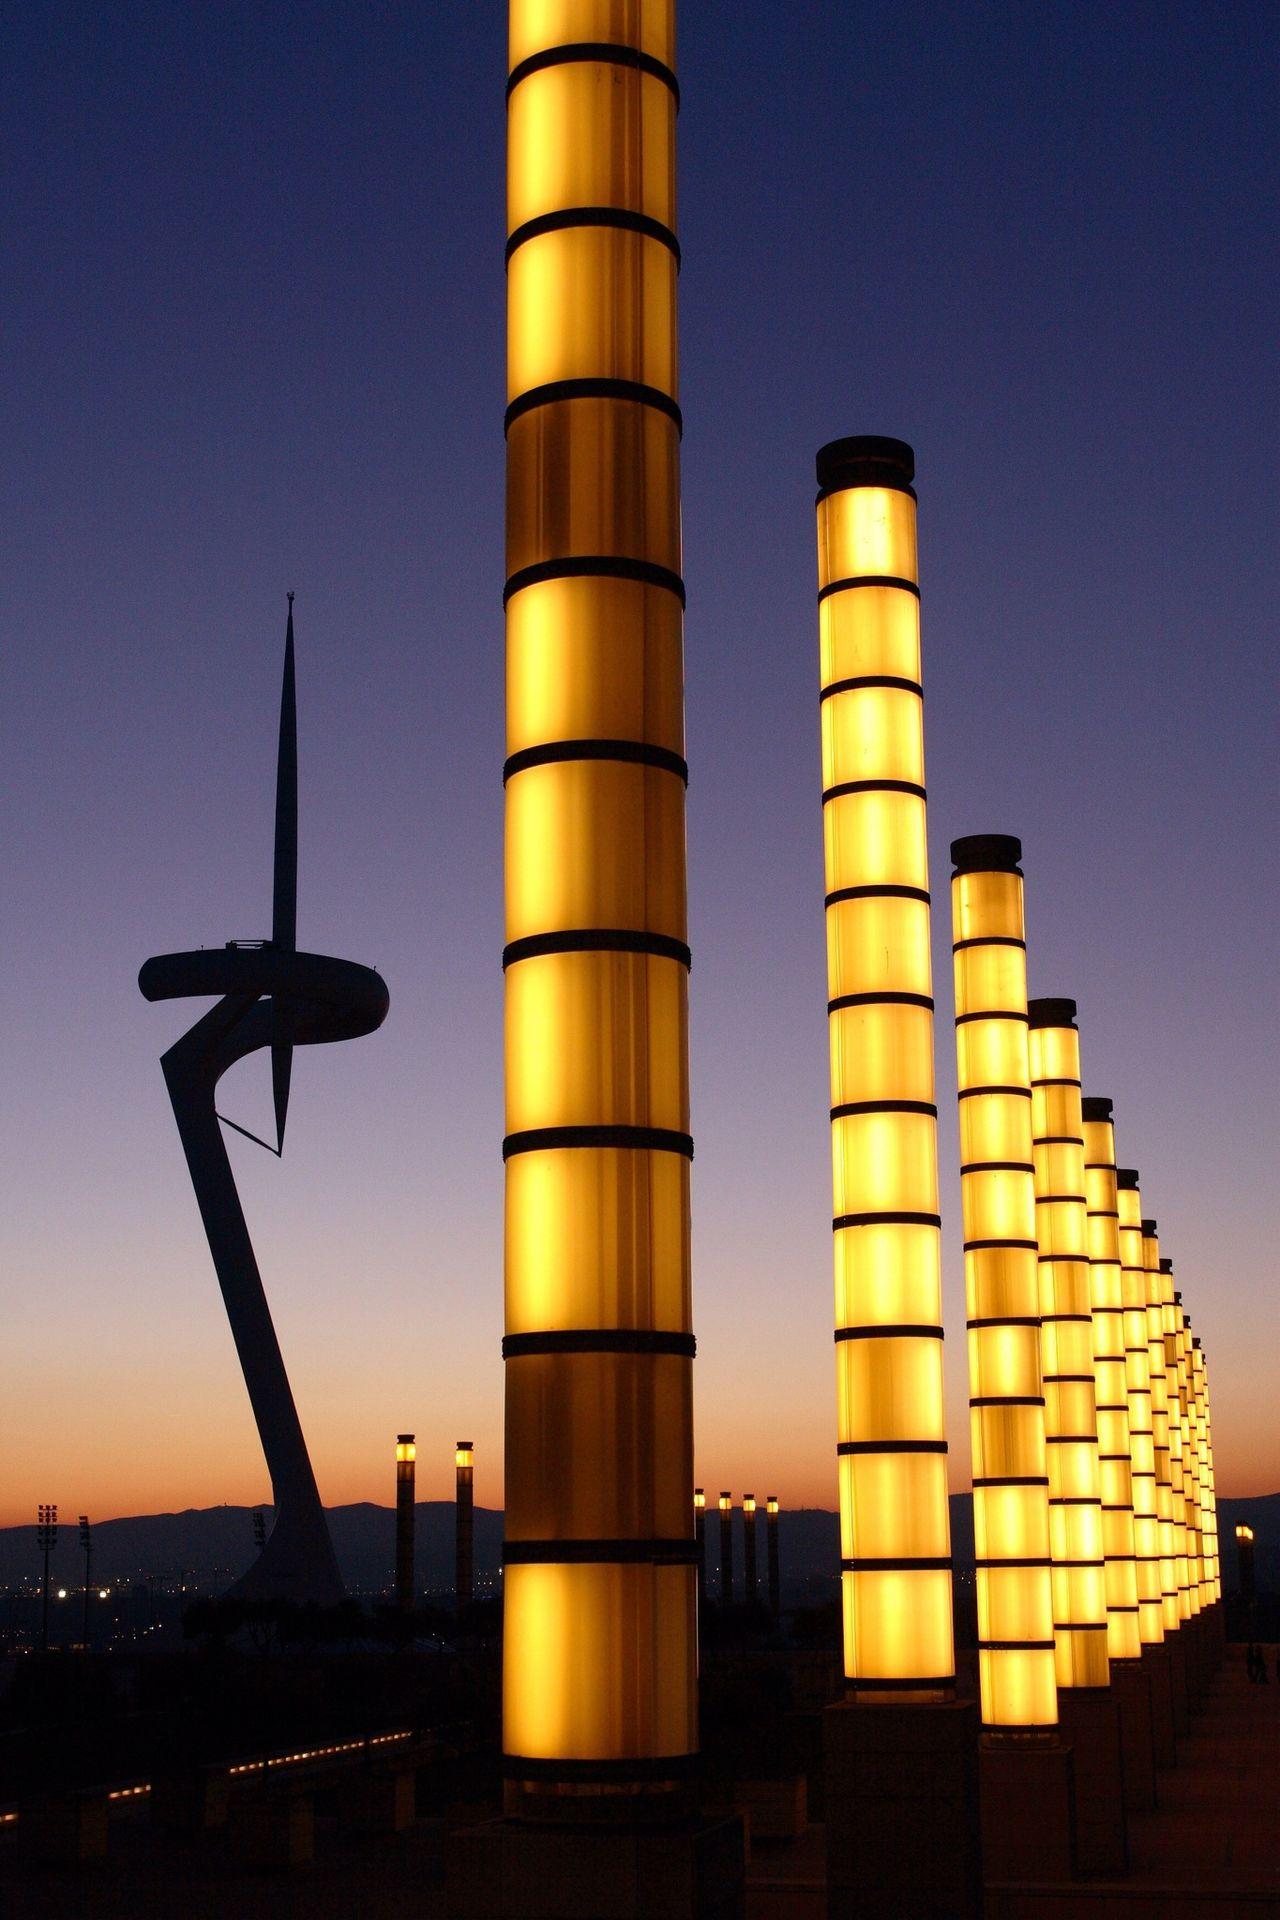 Montjuic Barcelona Torre Calatrava The Architect - 2017 EyeEm Awards